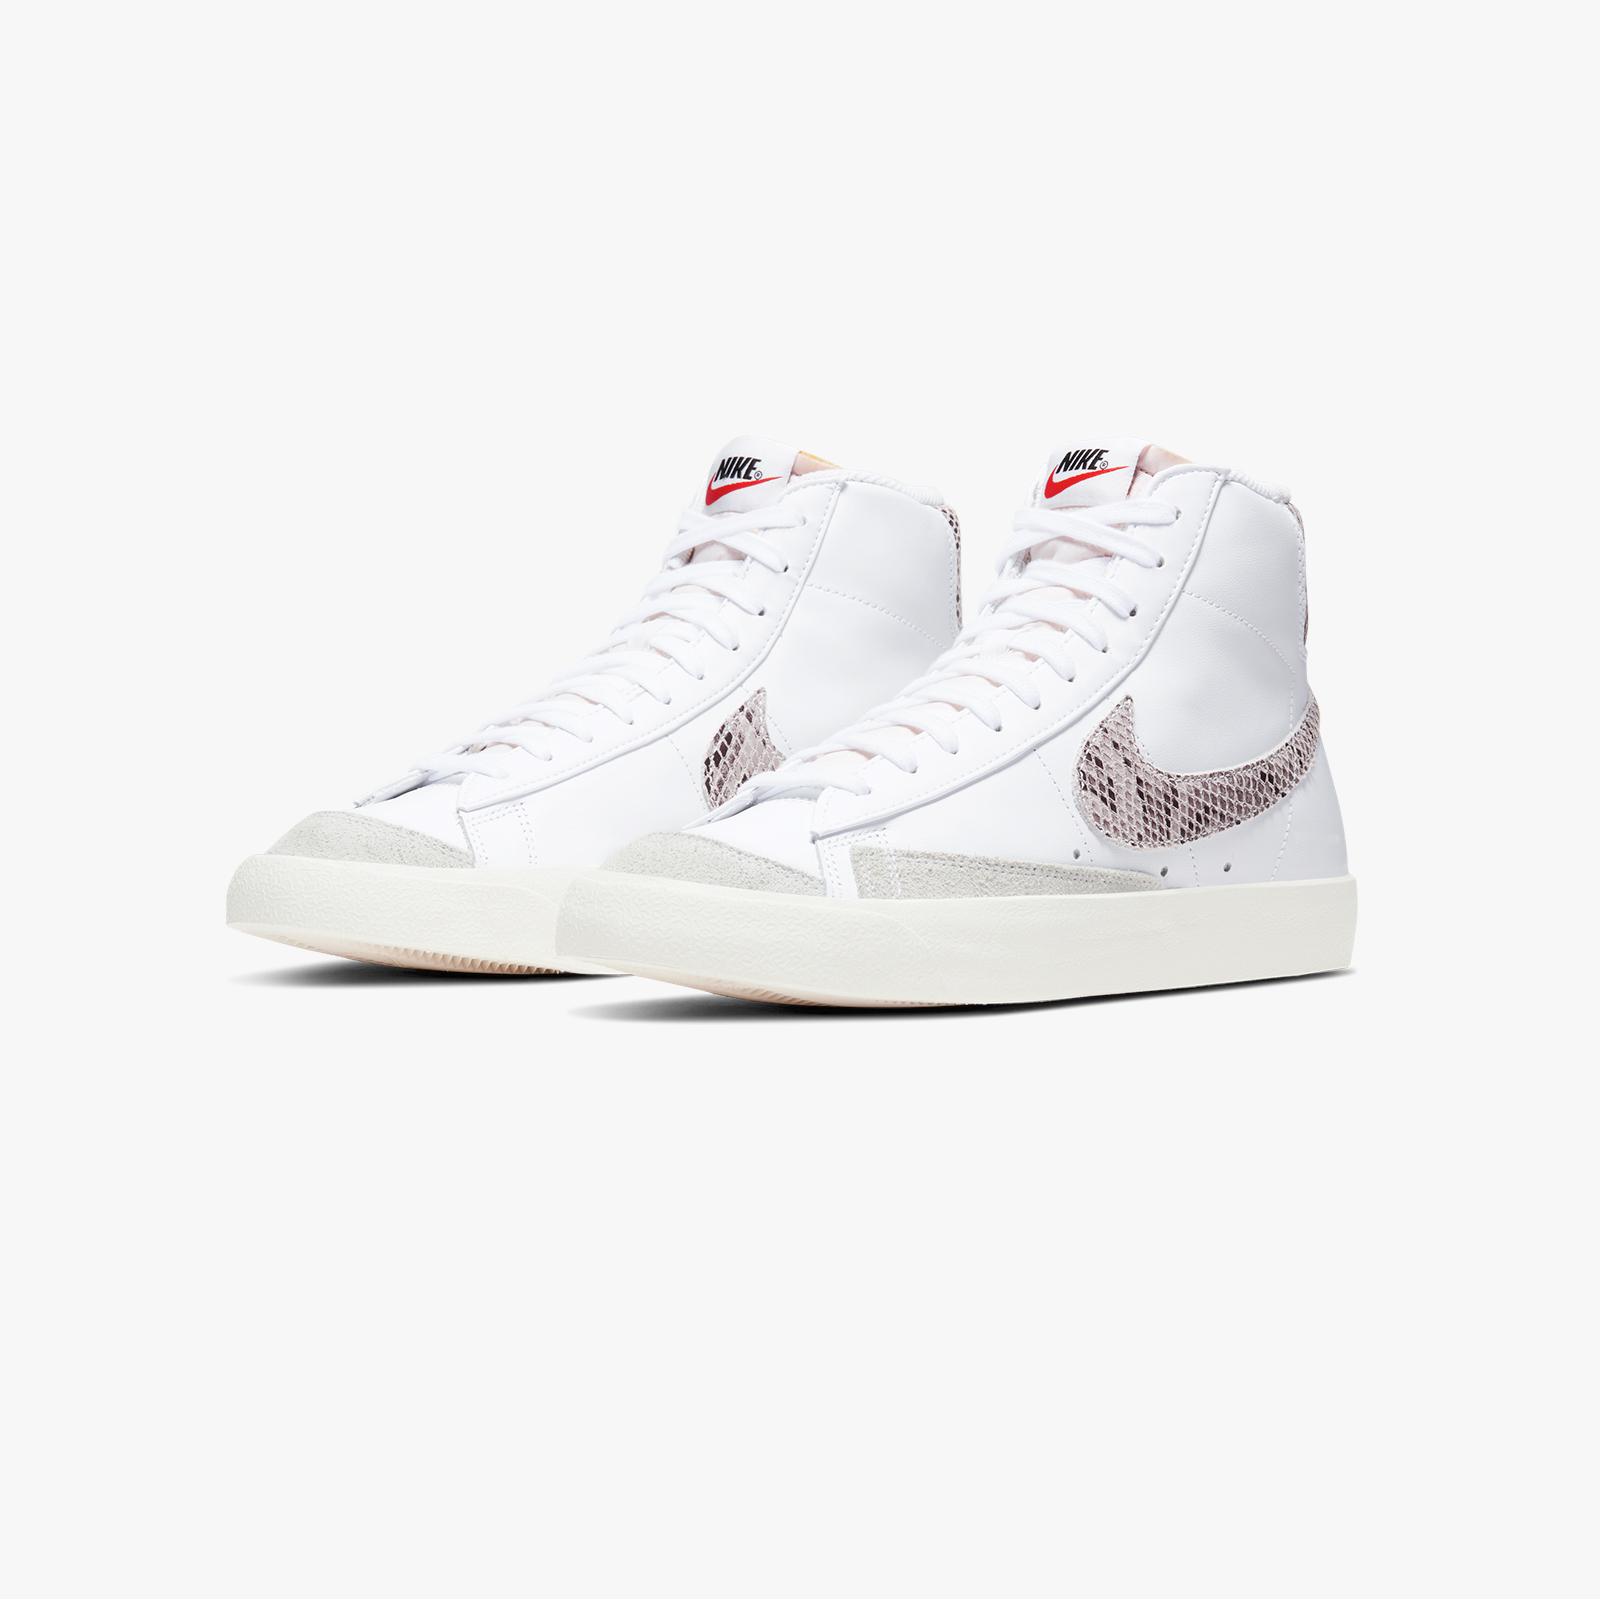 Nike Blazer Mid 77 VNTG Reptile - Ci1176-101 - SNS | sneakers ...